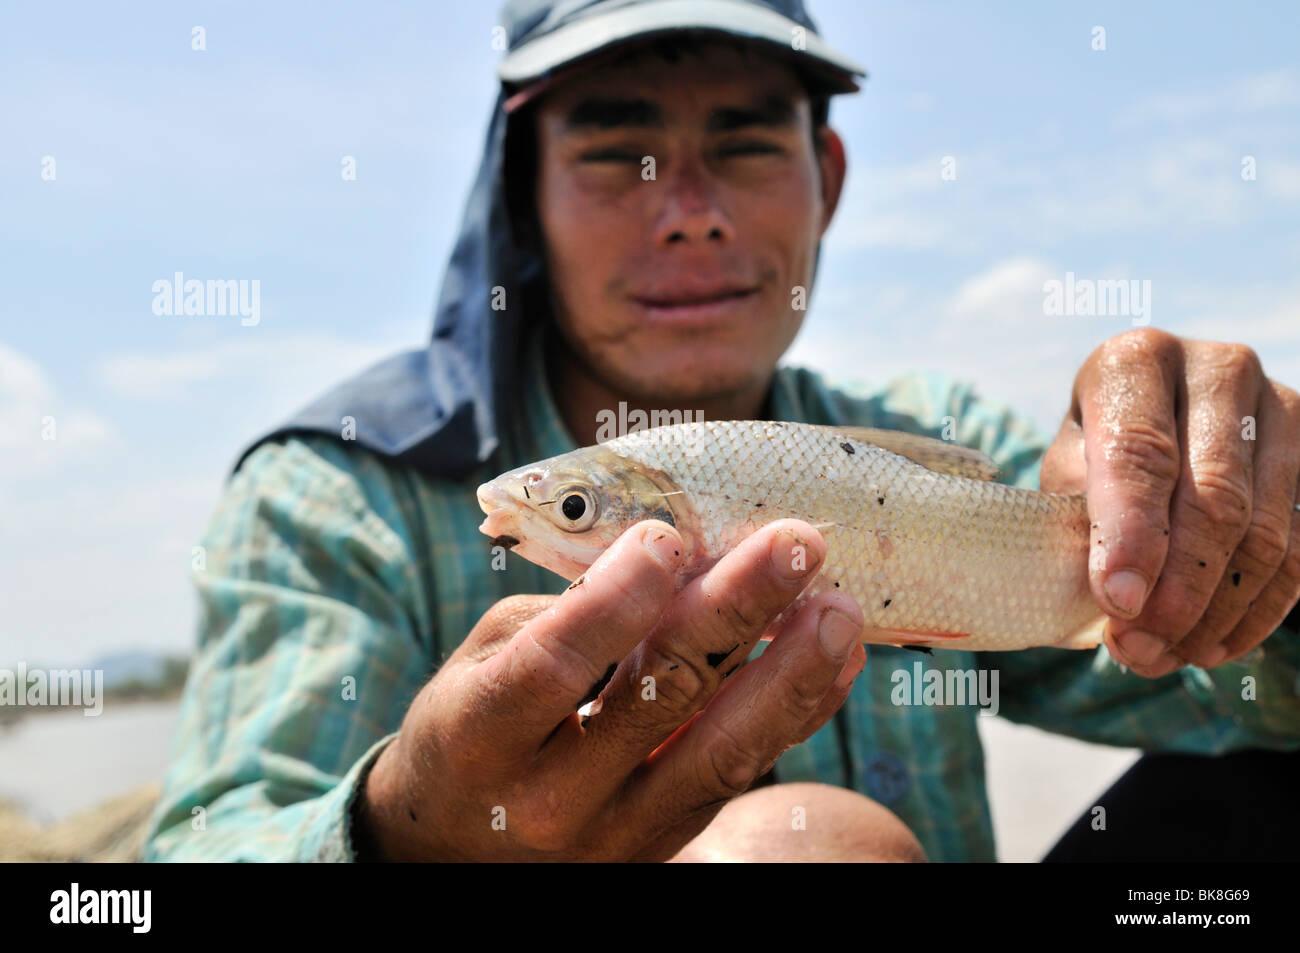 Fisherman with his catch on the Rio Magdalena River, La Dorada, Caldas, Colombia, South America - Stock Image